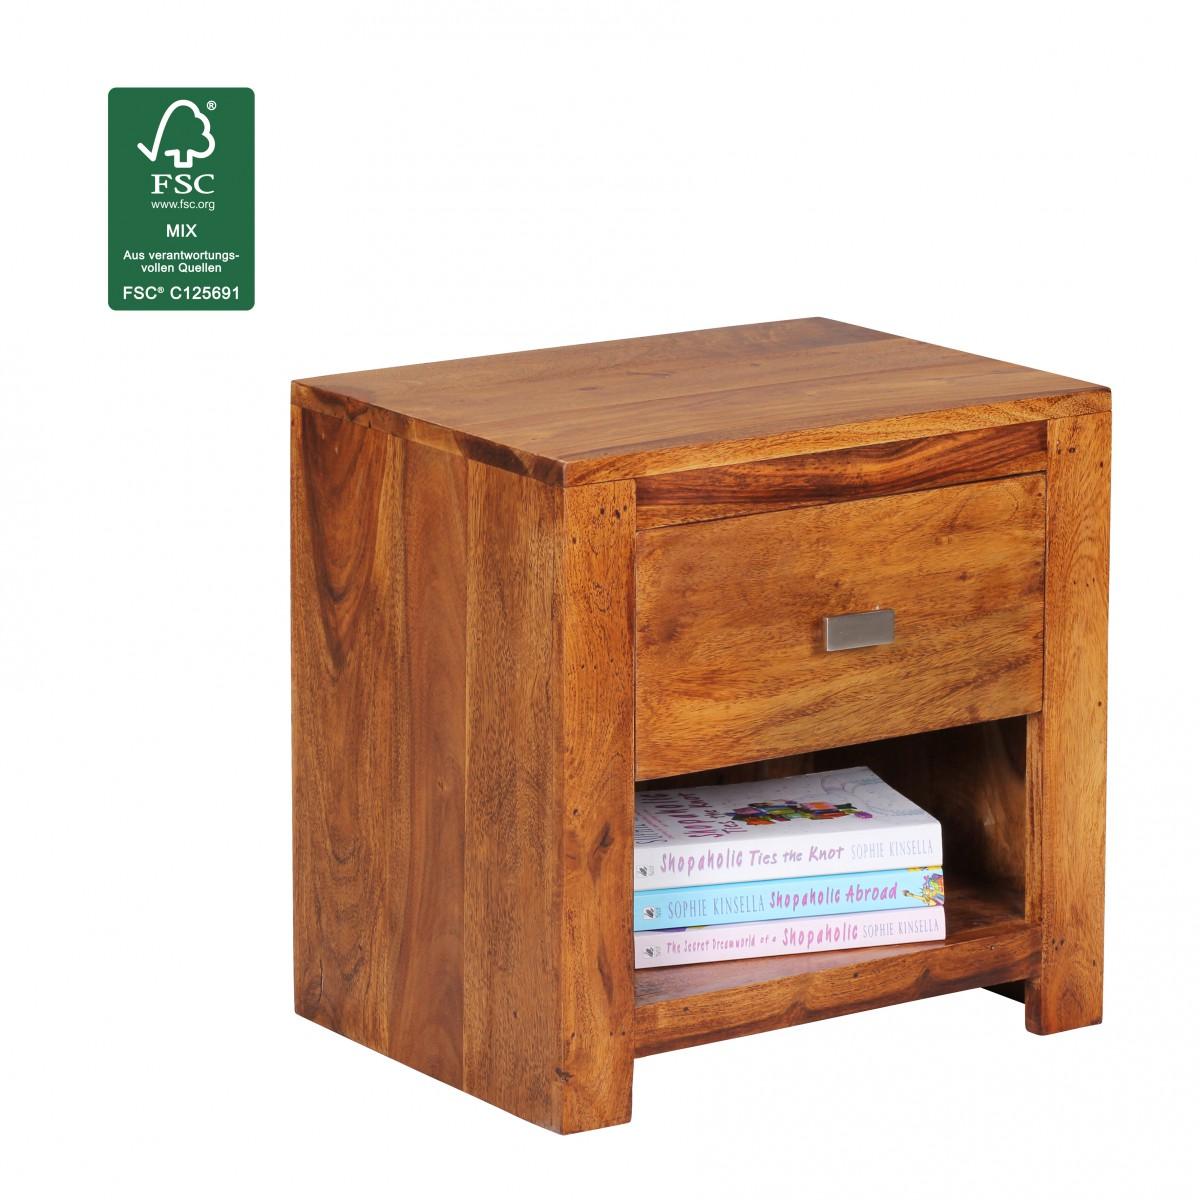 Wohnling sheesham massif bois table de chevet bois tiroir - Table de chevet largeur 30 cm ...